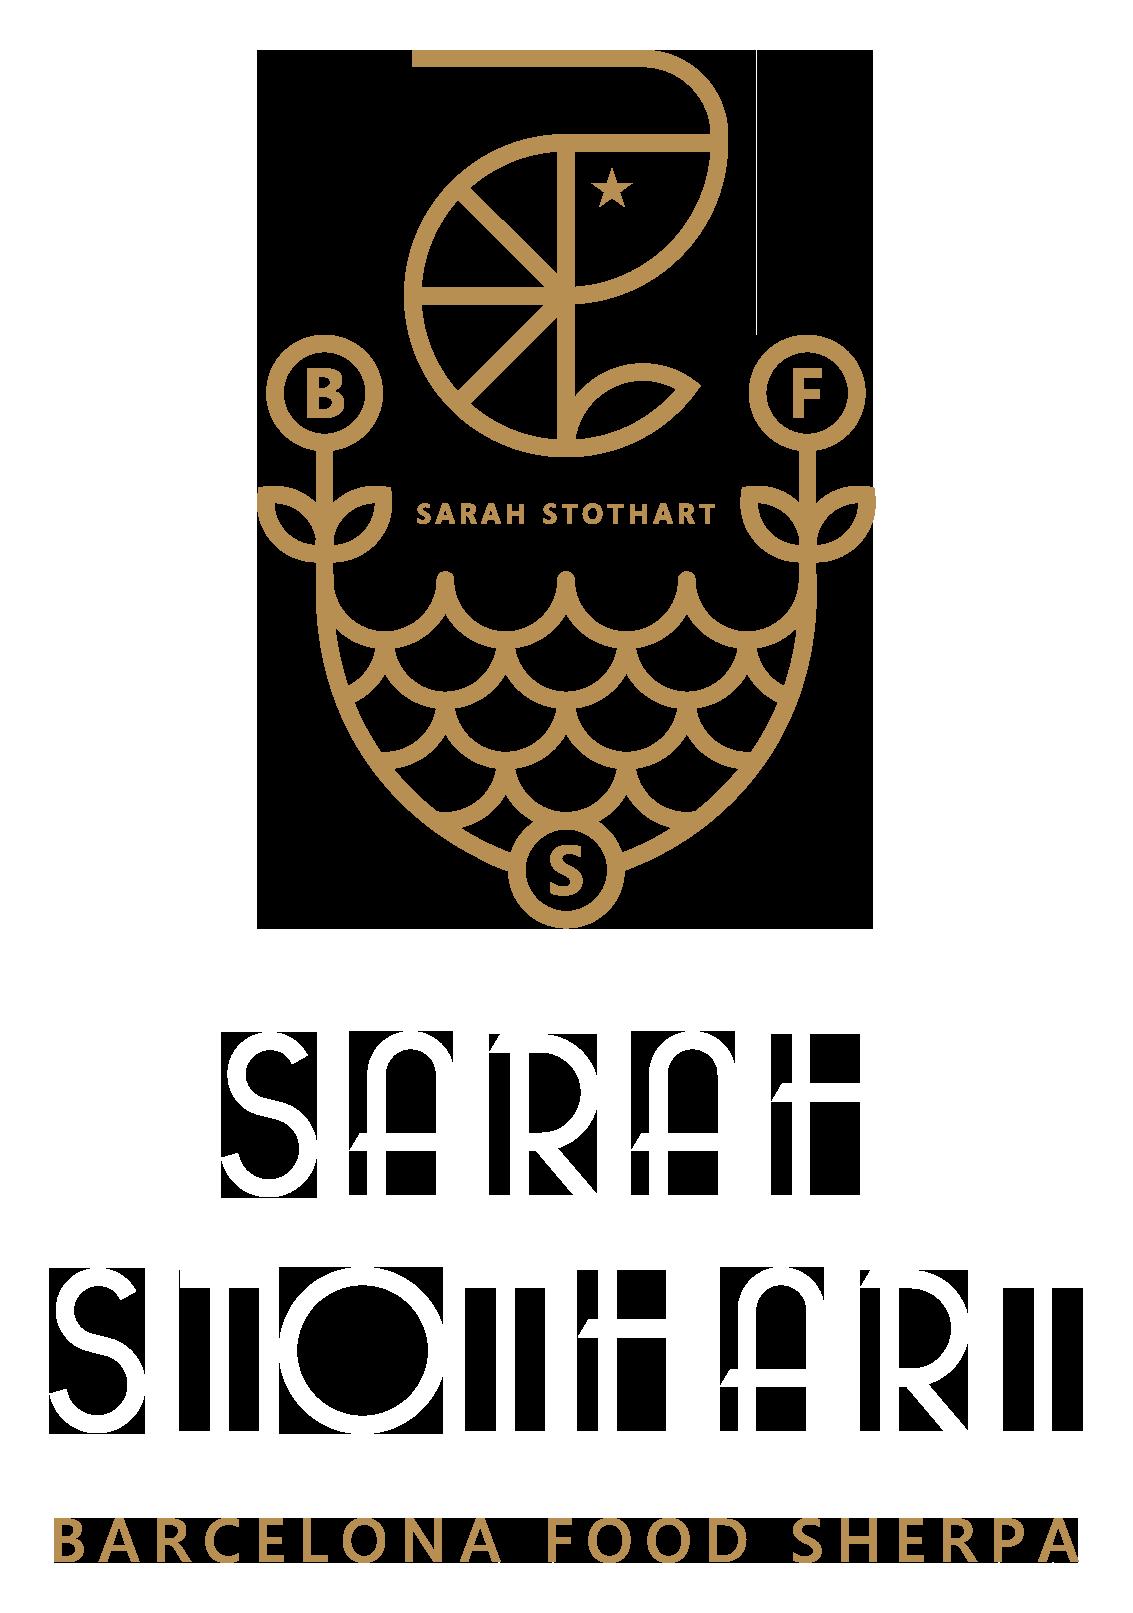 Sarah Stothart - Barcelona Food Sherpa